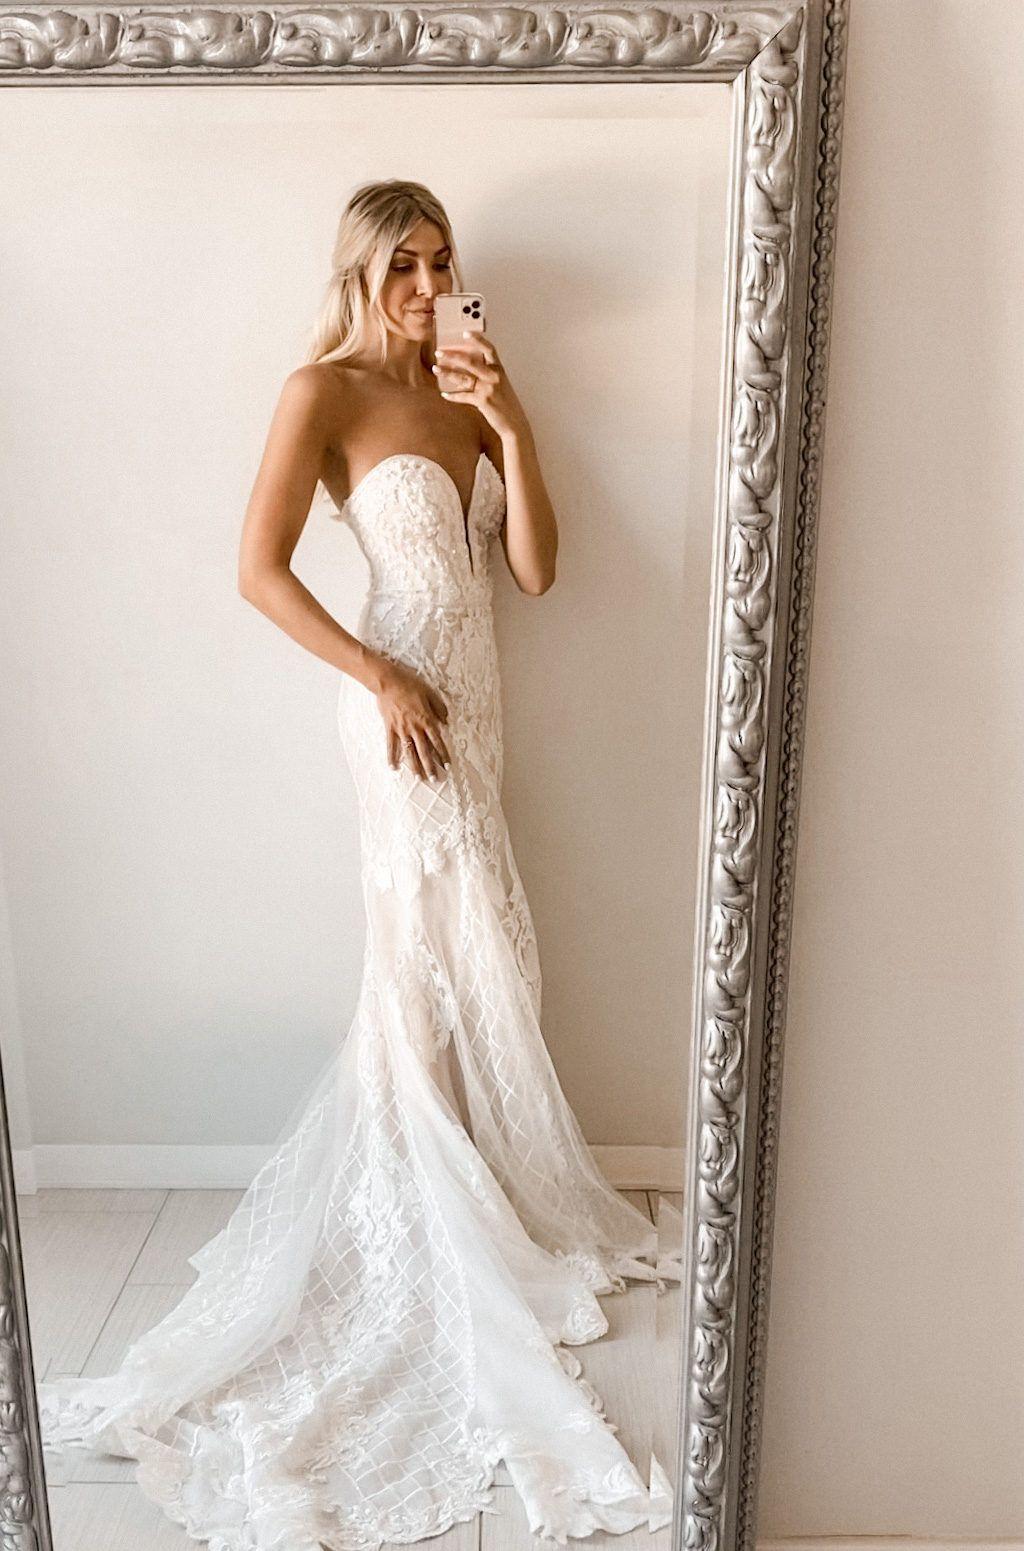 Beaded Scroll And Lace Mermaid Wedding Dress David S Bridal Davids Bridal Wedding Dresses Petite Wedding Dress Glitter Bridesmaid Dresses [ 1551 x 1024 Pixel ]